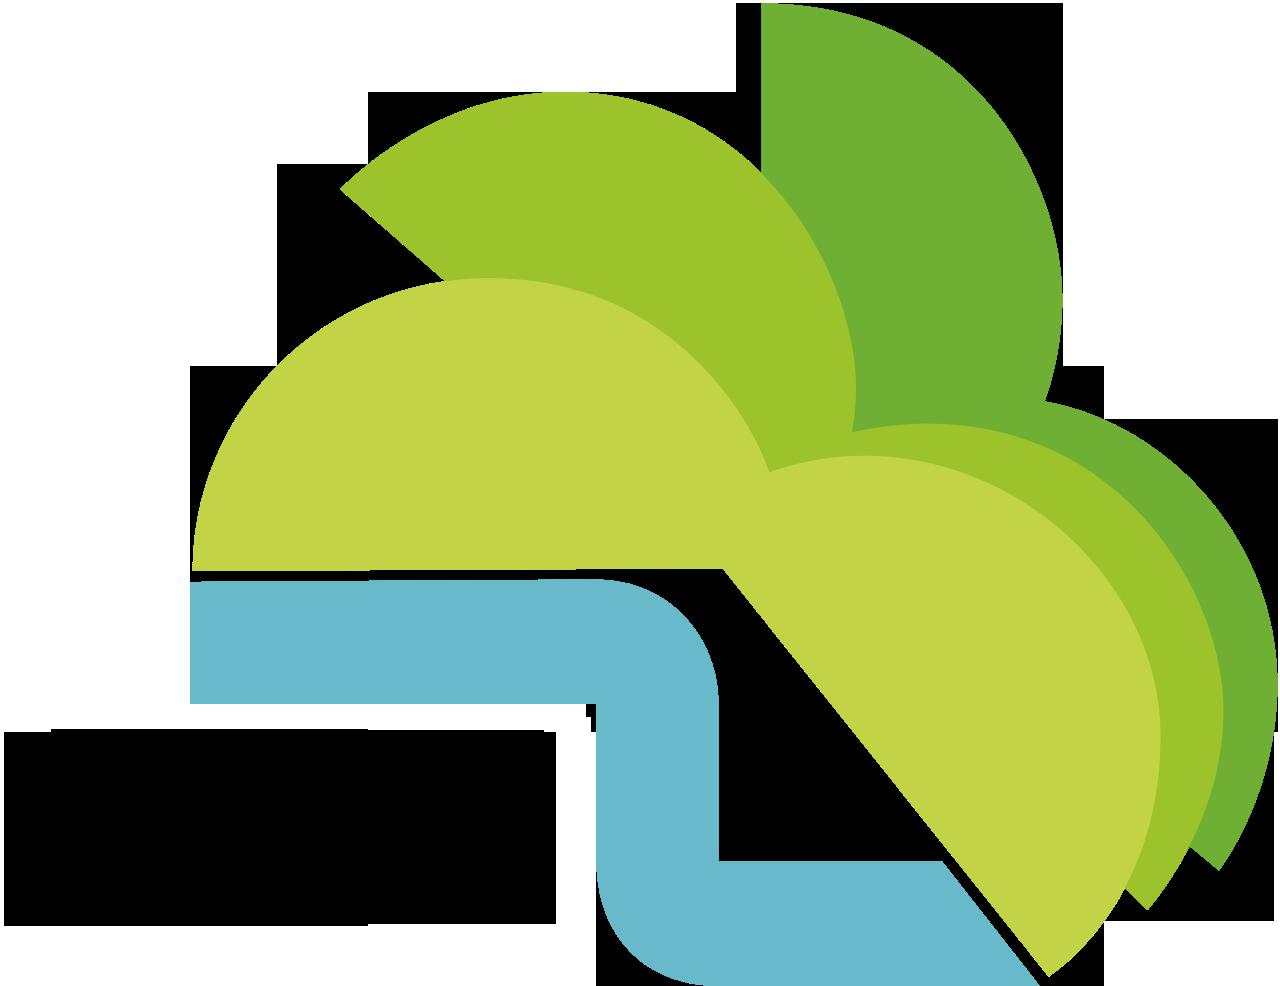 Swn-Nett Online-Portal